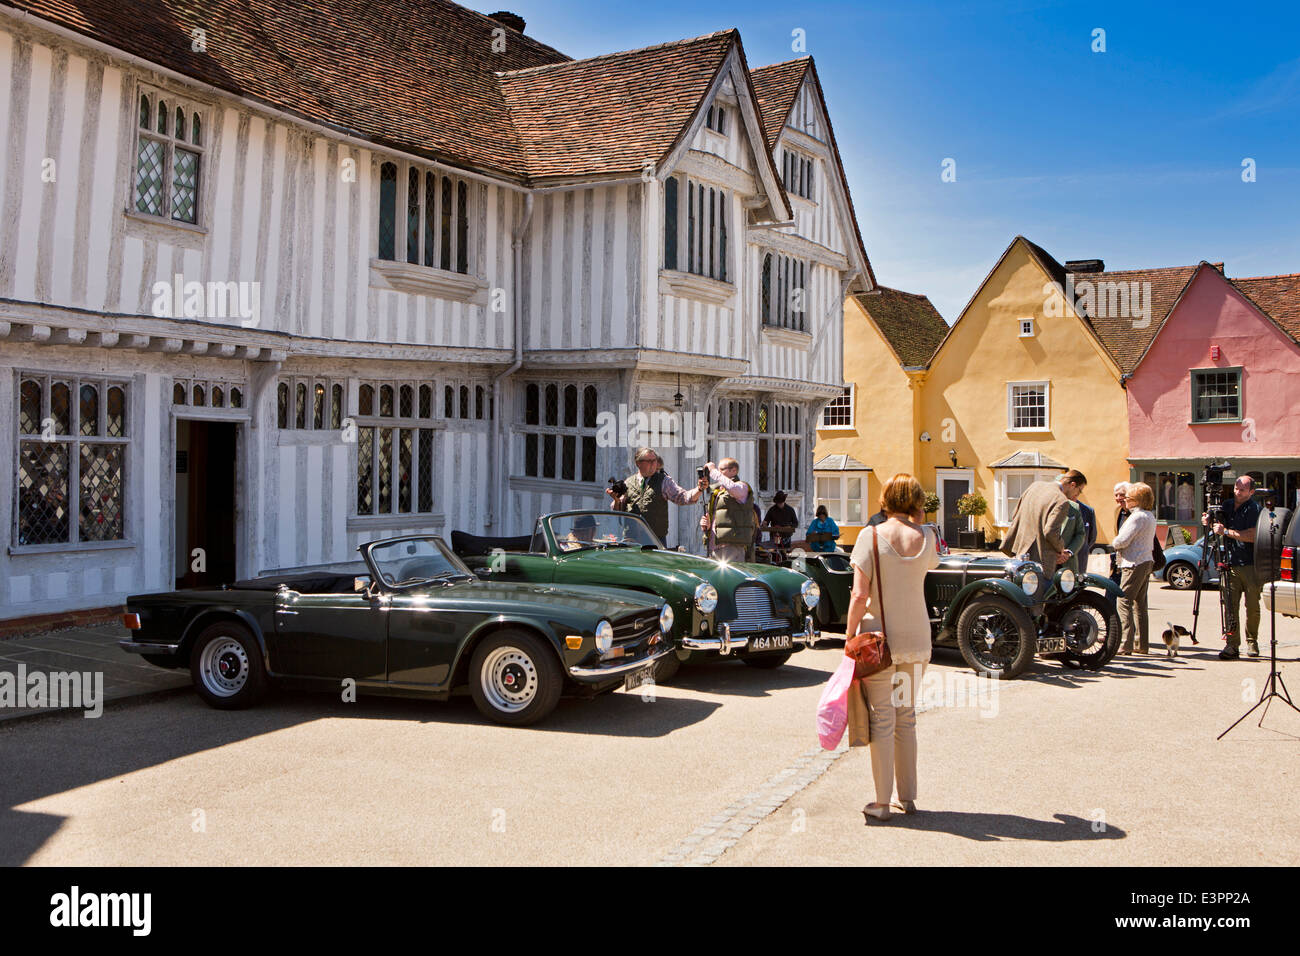 UK England, Suffolk, Lavenham, Market Square, classic car photoshoot outside Guildhall - Stock Image